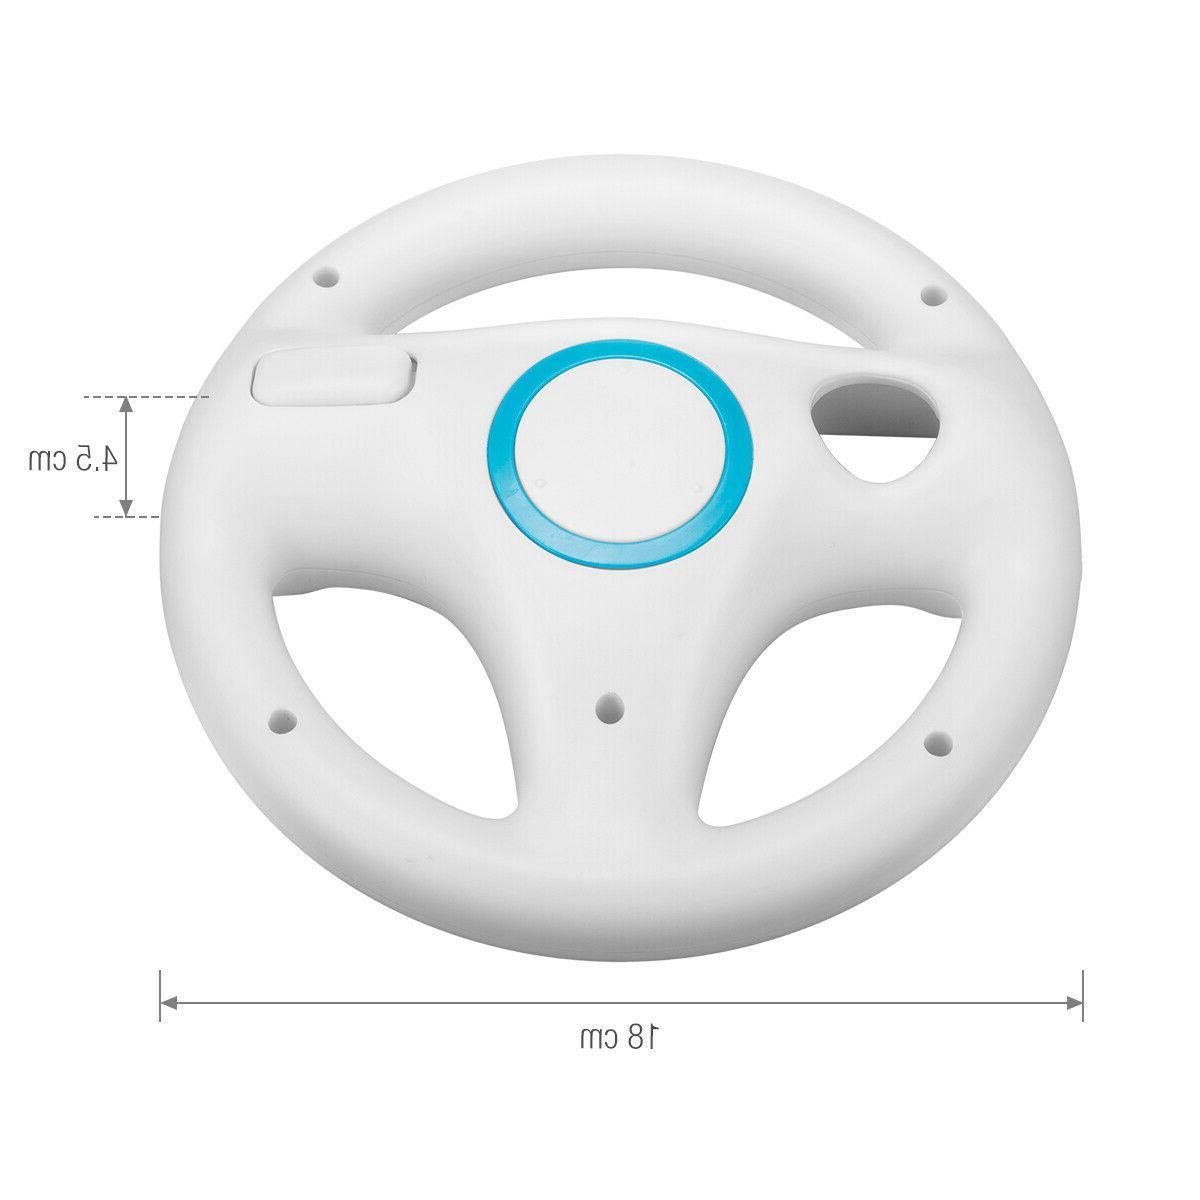 2Pc Game Mario Kart Remote Controller